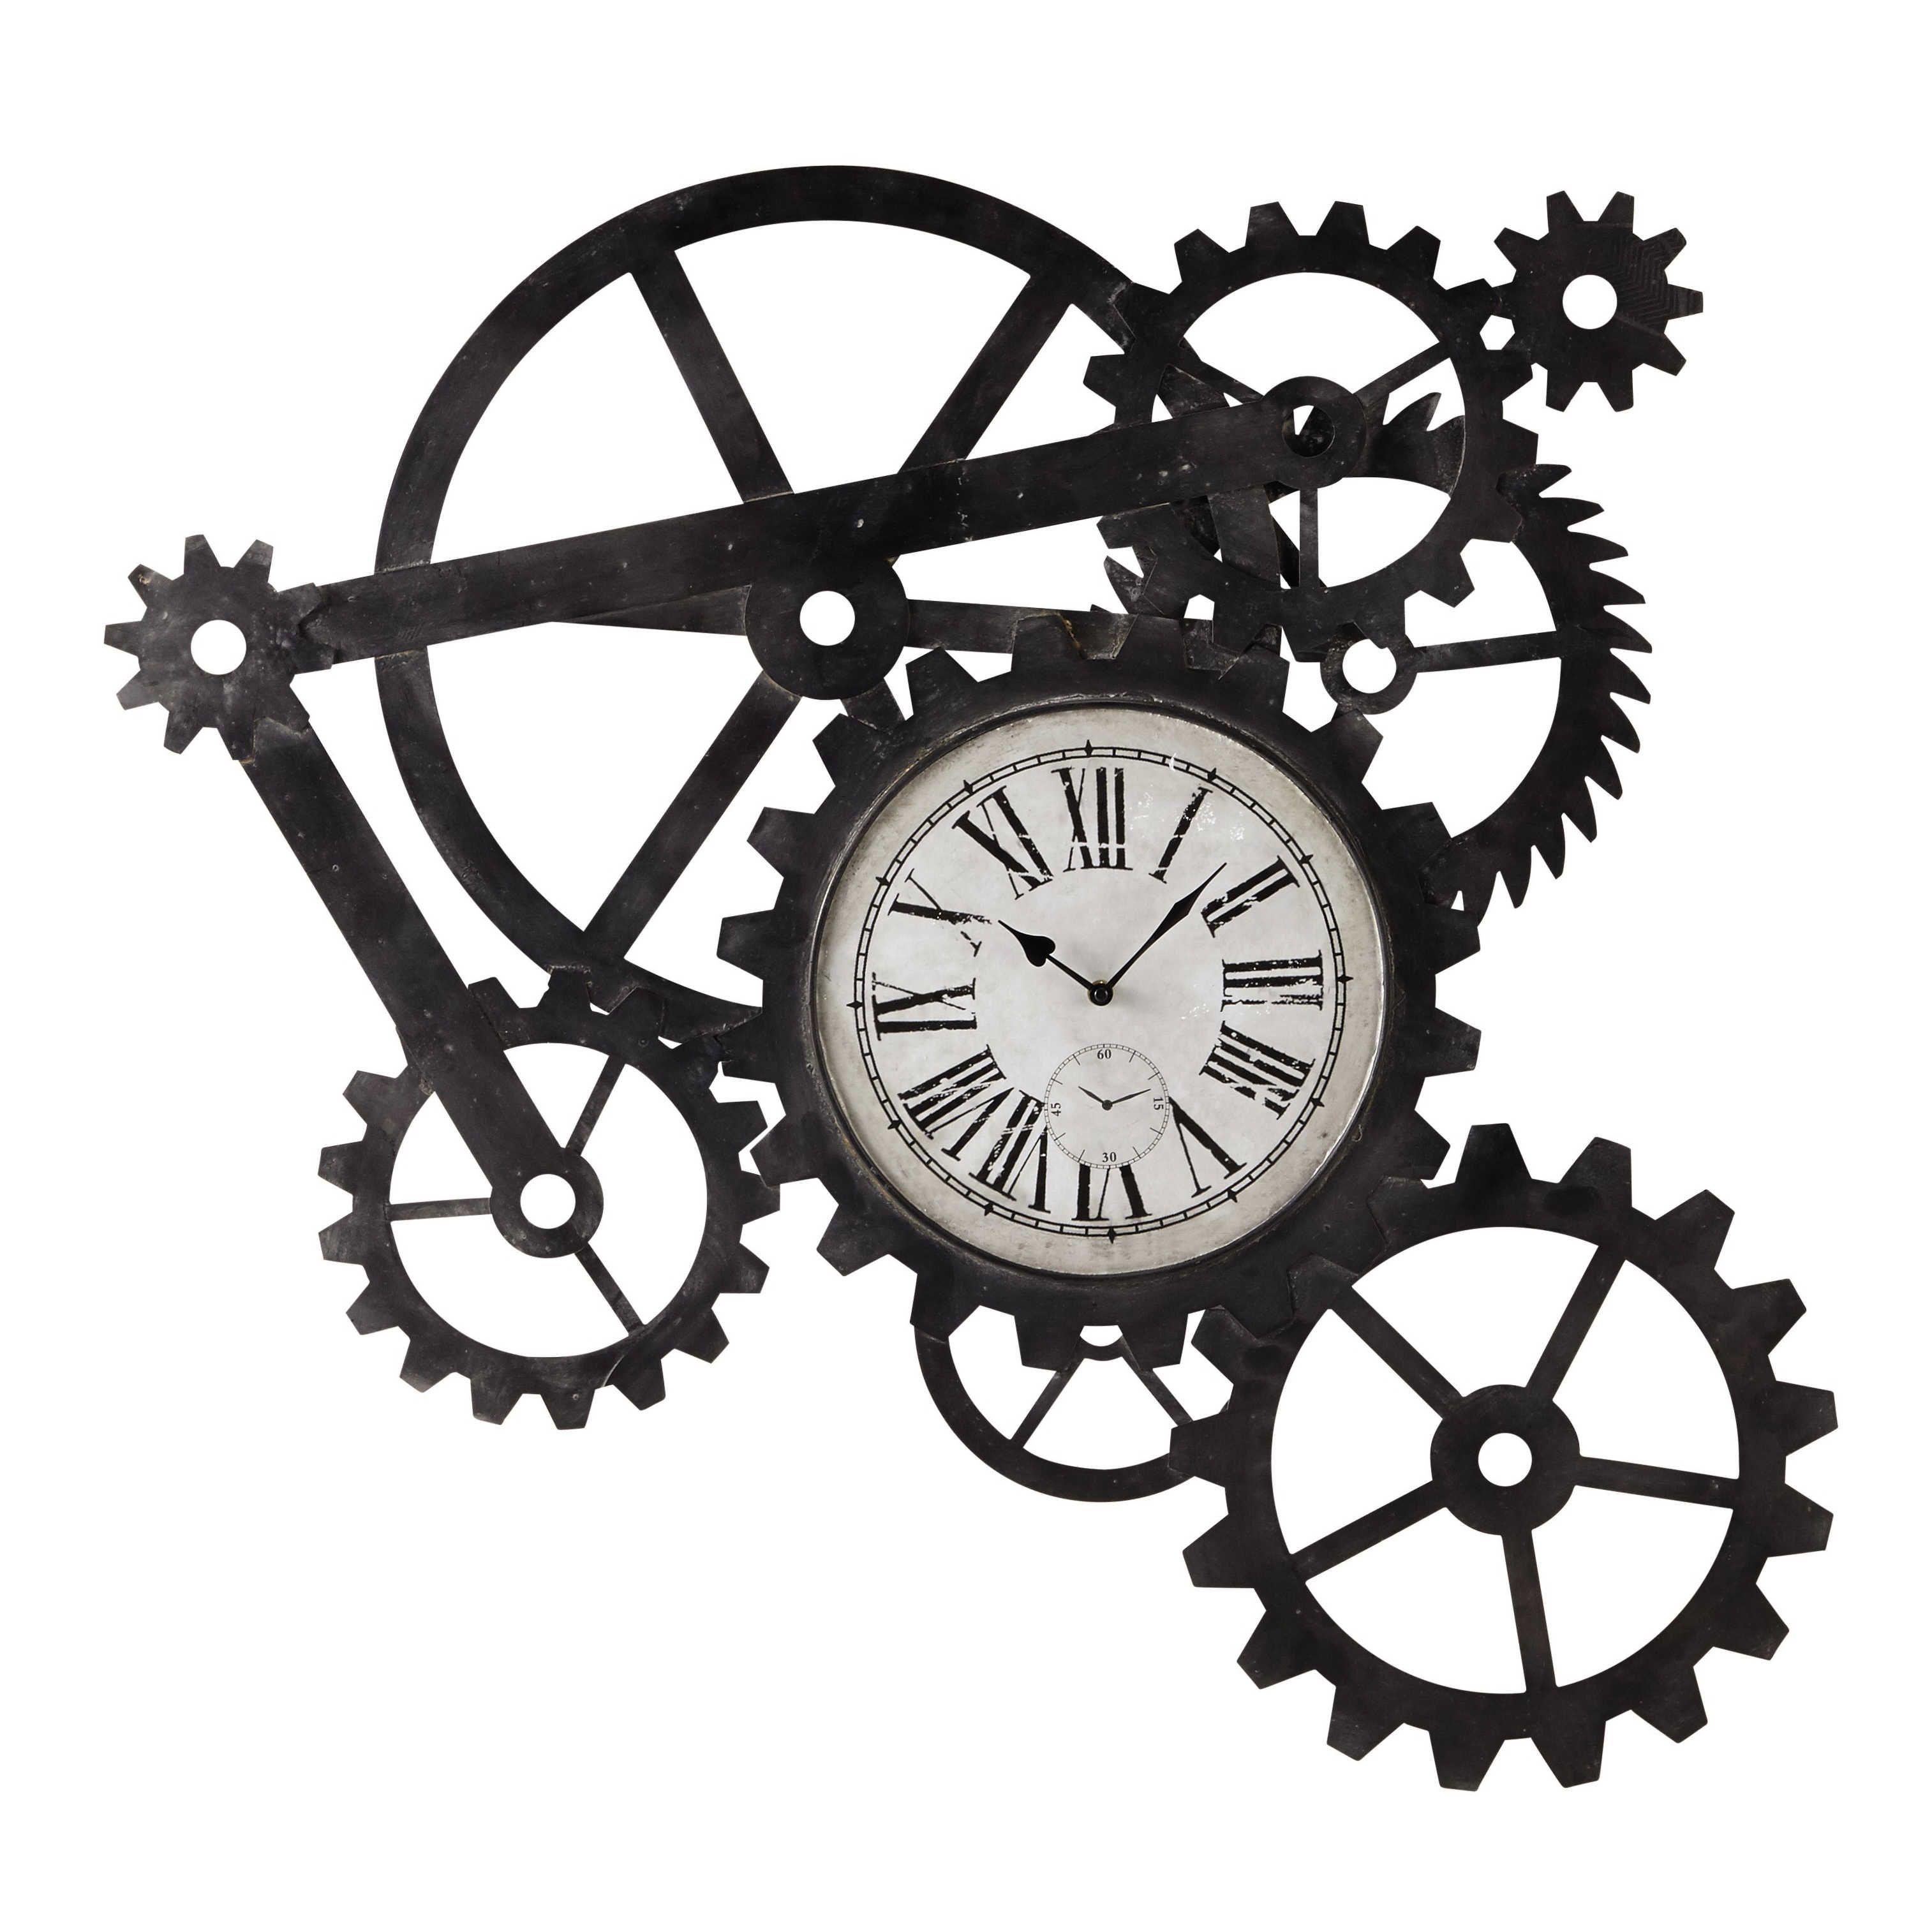 horloge indus en métal l 86 cm engrenage